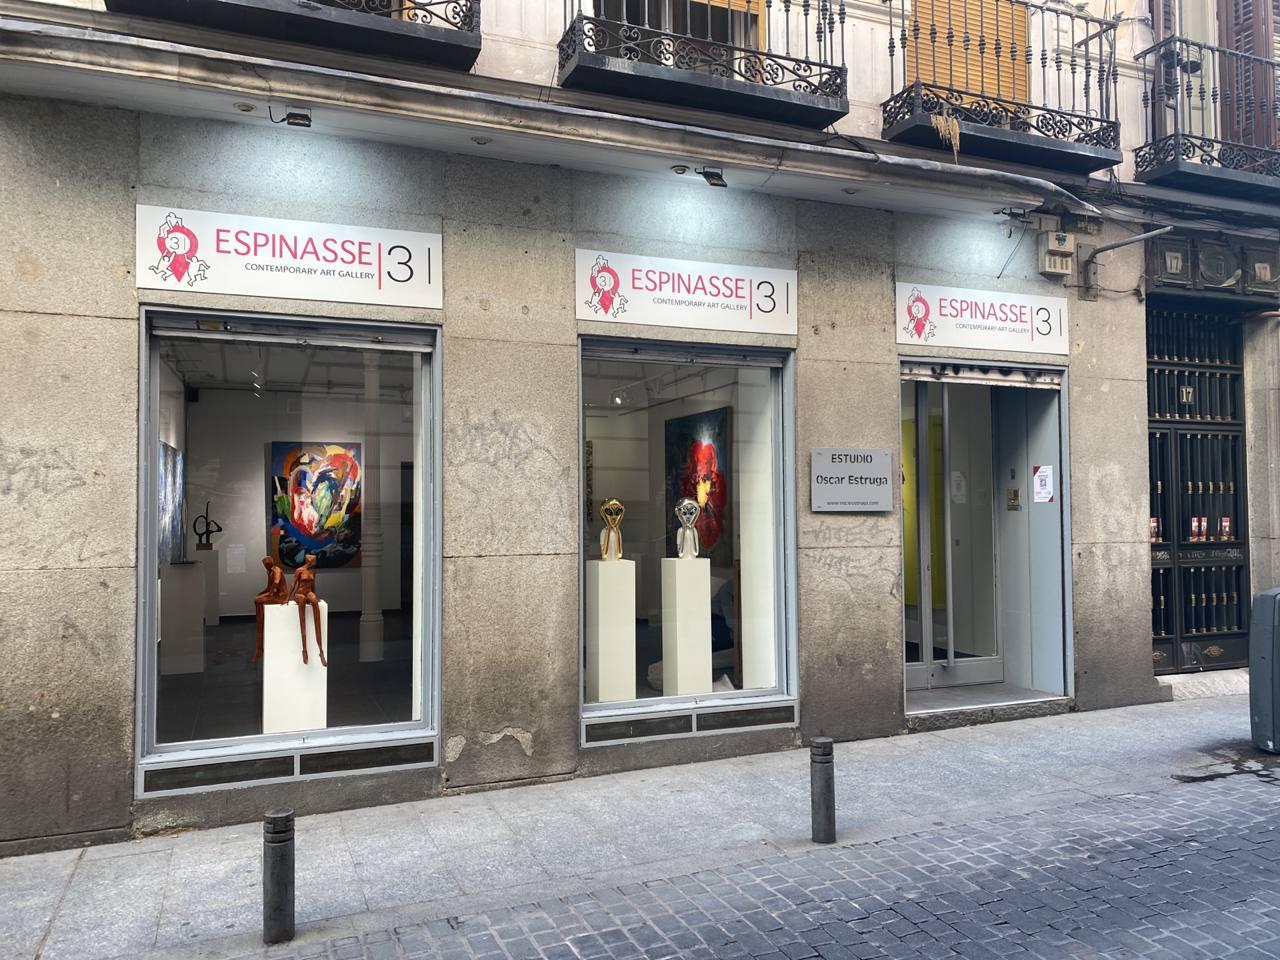 Contemporary Art in Madrid